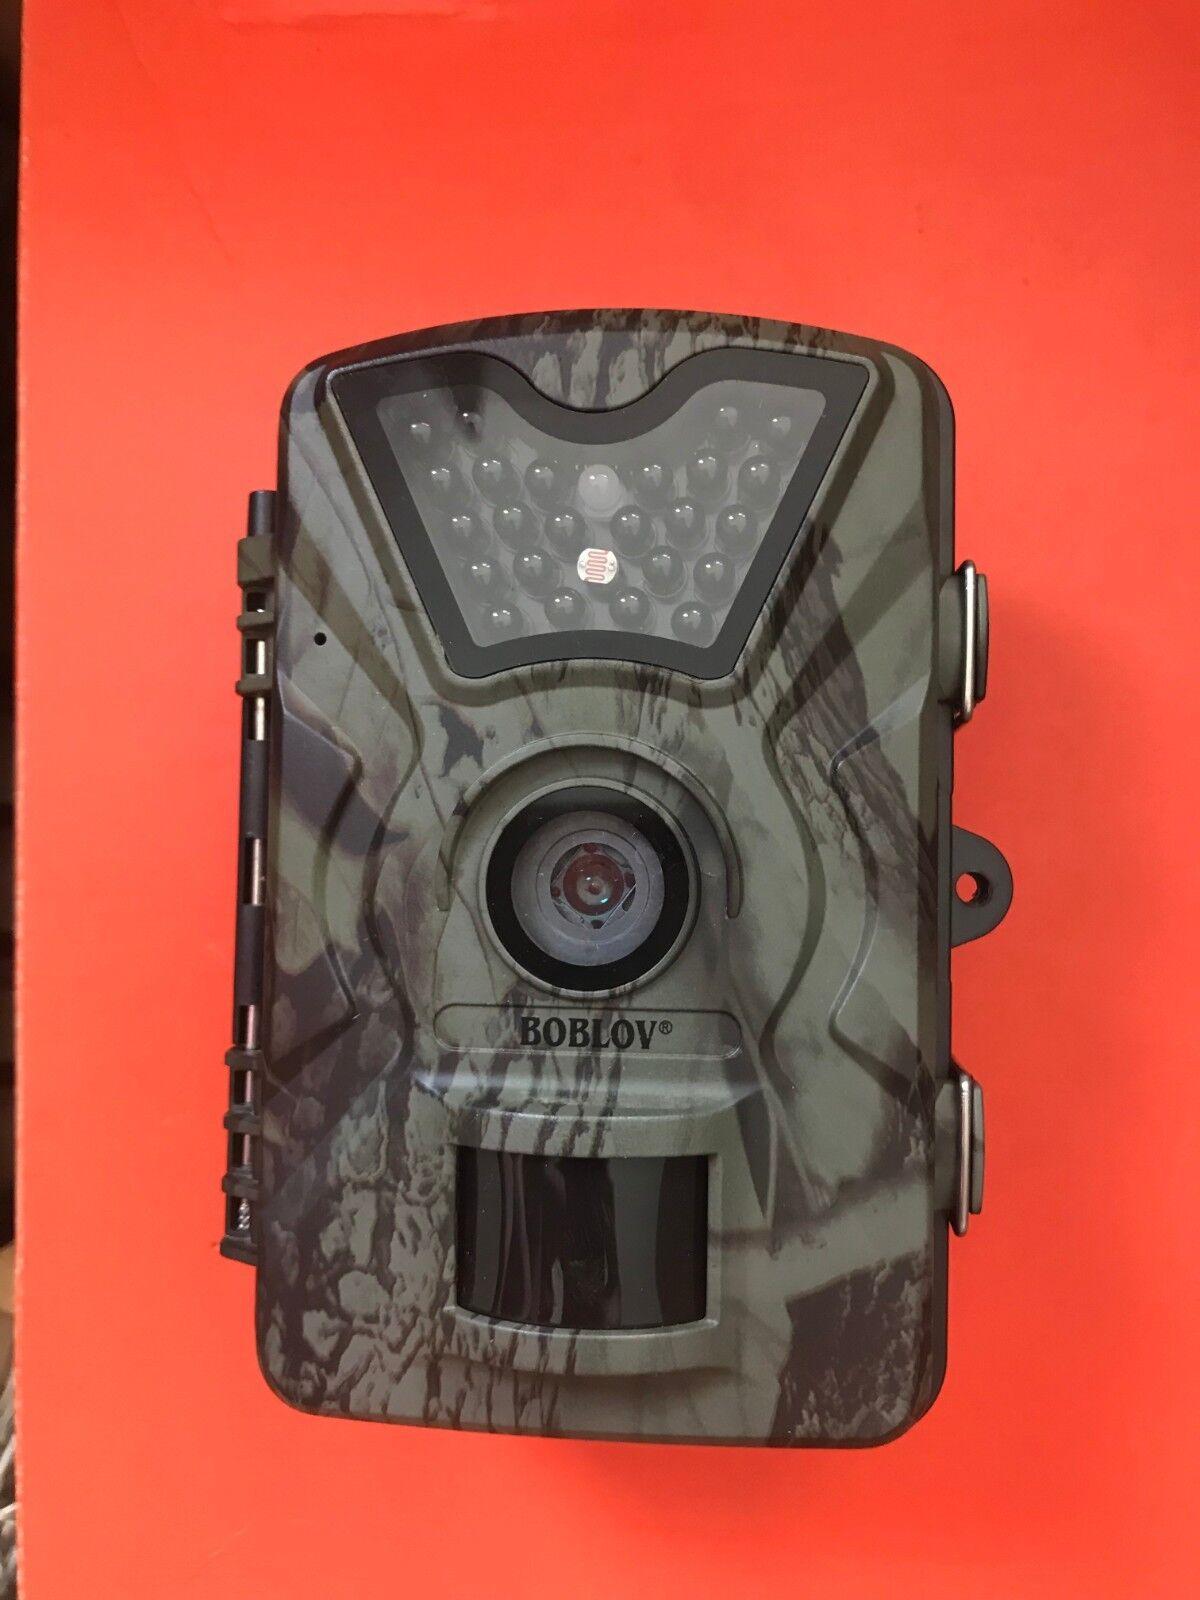 12MP Outdoor Wildlife Camera with Video Recording capabilities (IP54 waterproof)